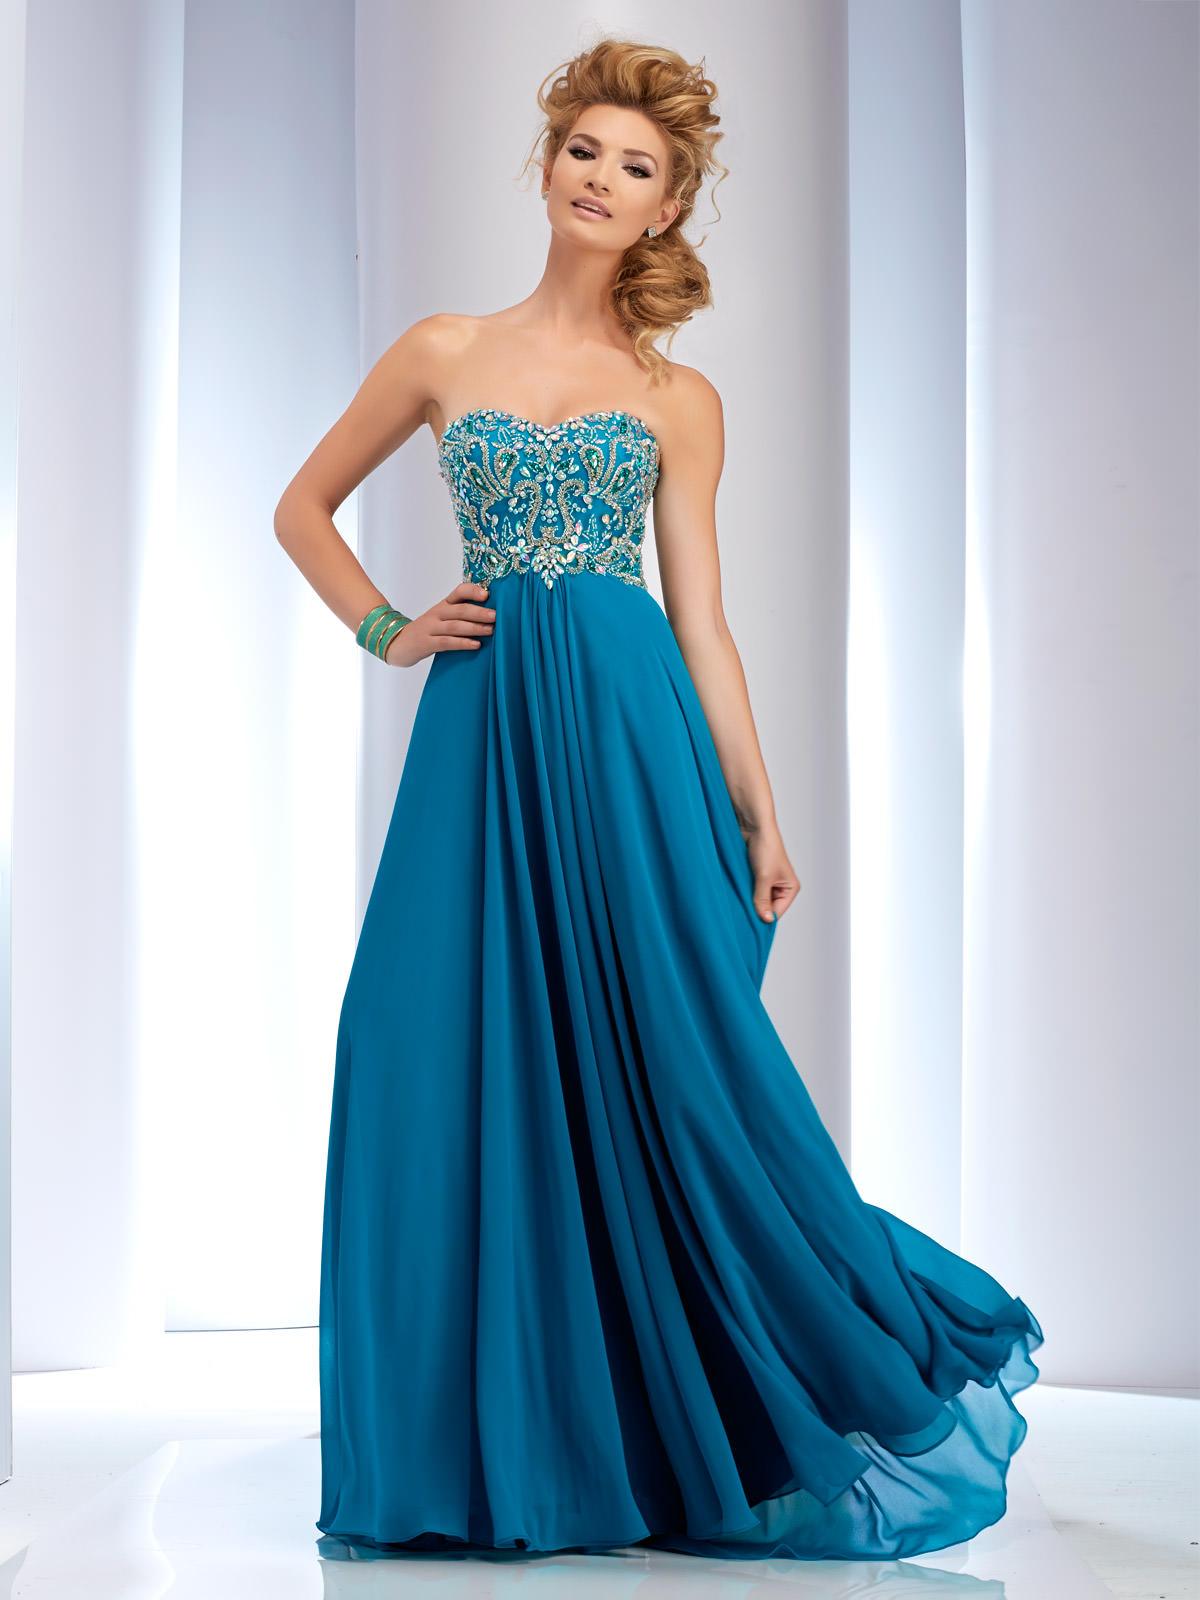 macys gala dresses photo - 1